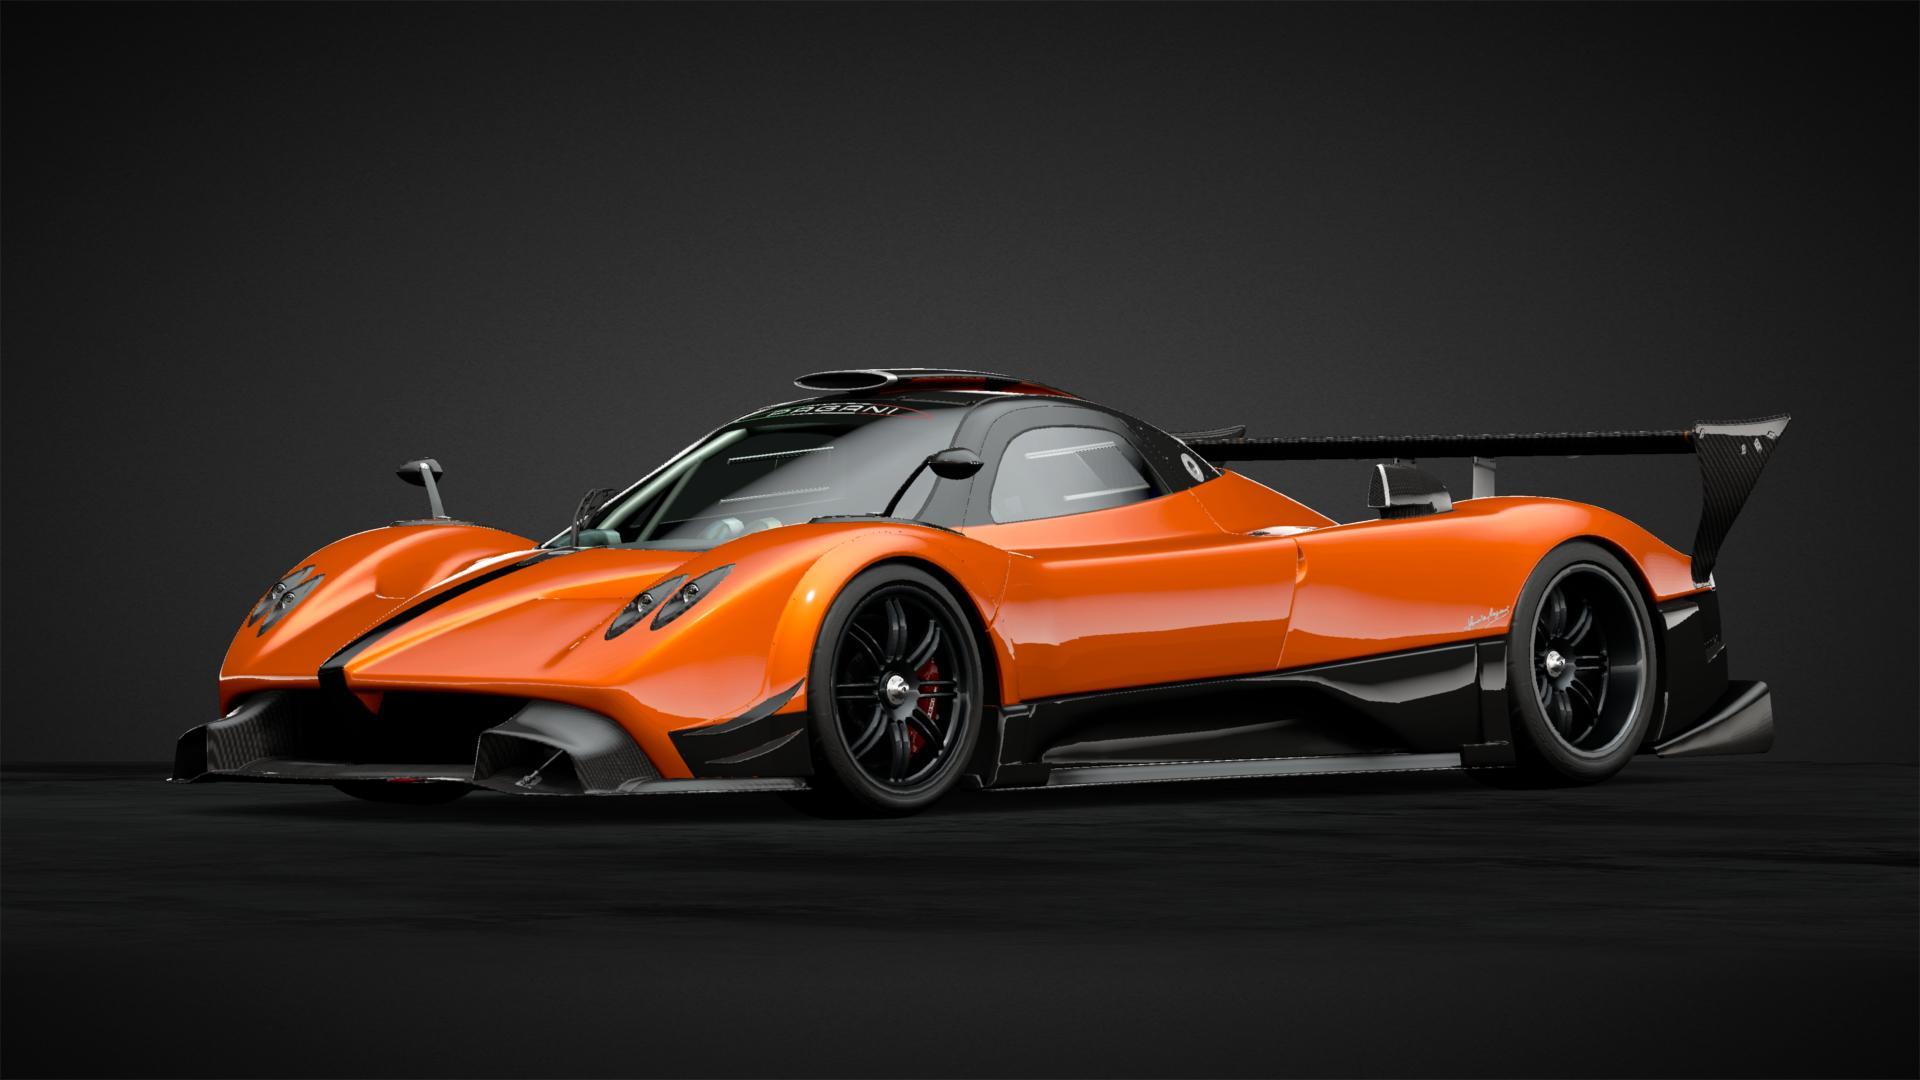 Pagani Zonda R Cinque Nfs Hp Car Livery By Worthlessfailure Community Gran Turismo Sport